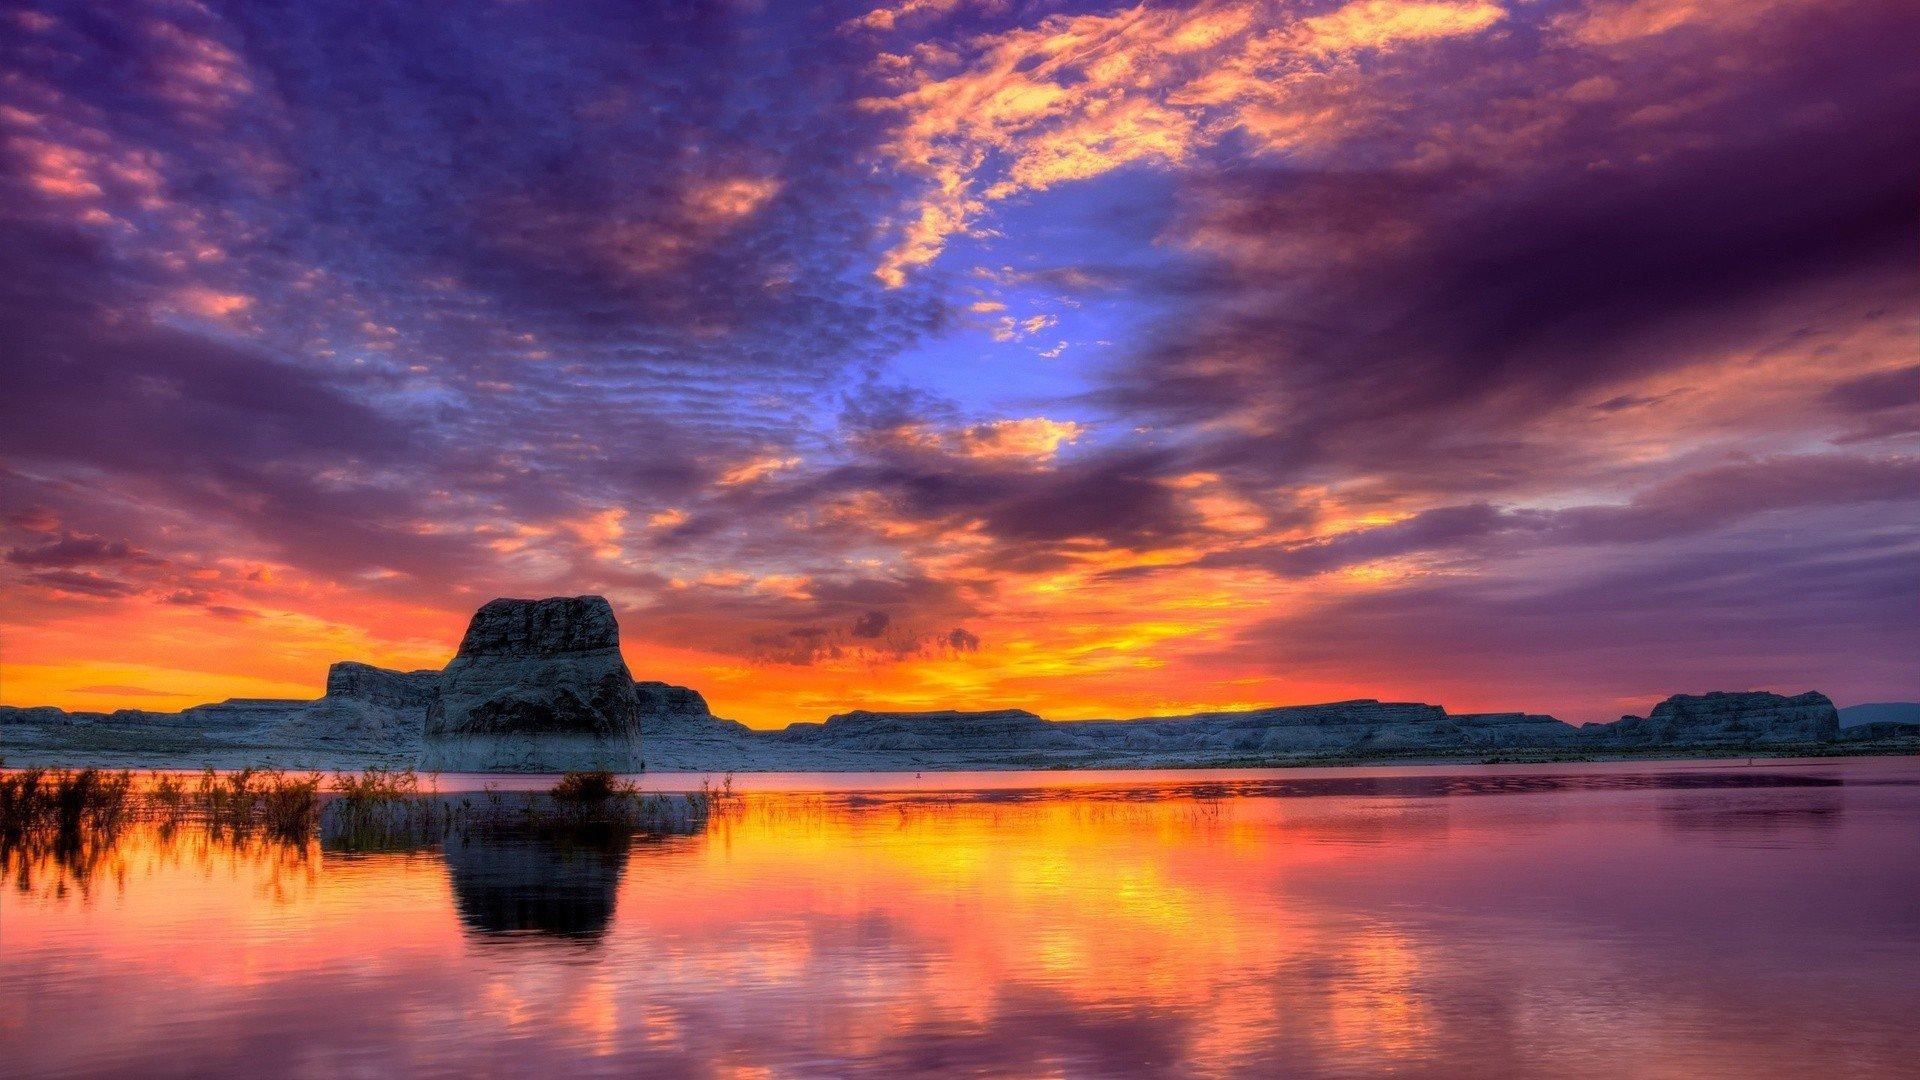 hd lake sunset ultra hd wallpaper share this ultra hd wallpaper on 1920x1080